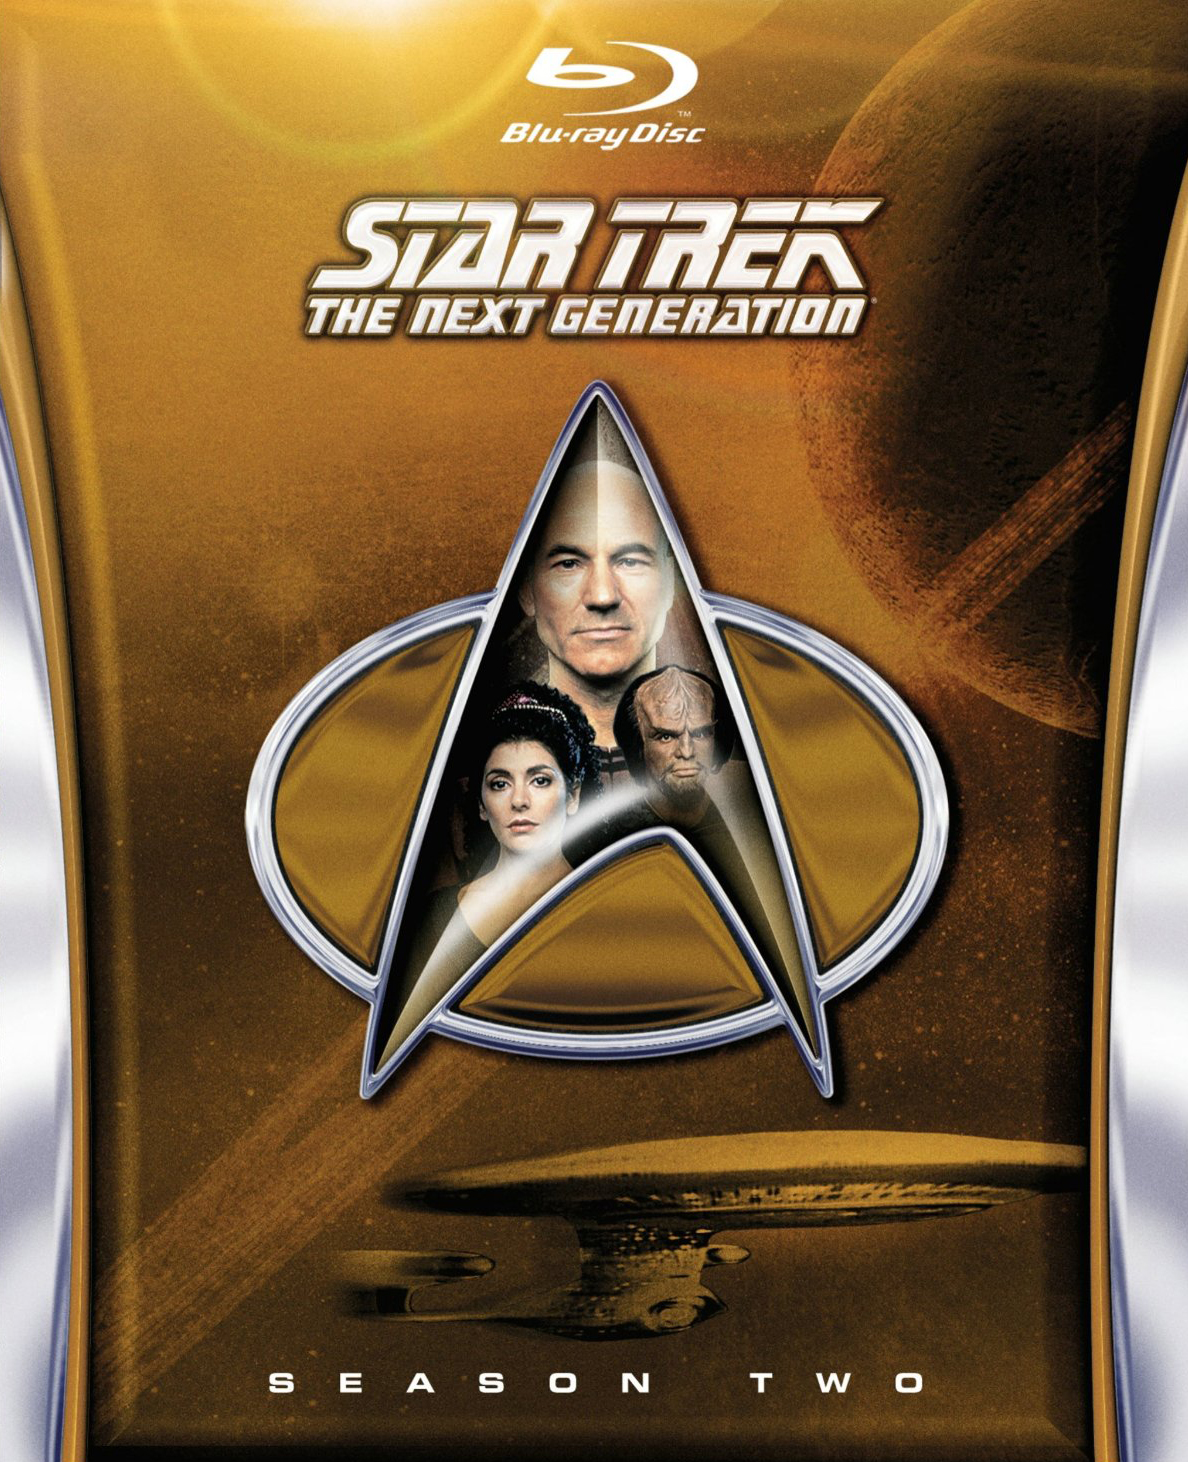 Making It So: Continuing Star Trek - The Next Generation